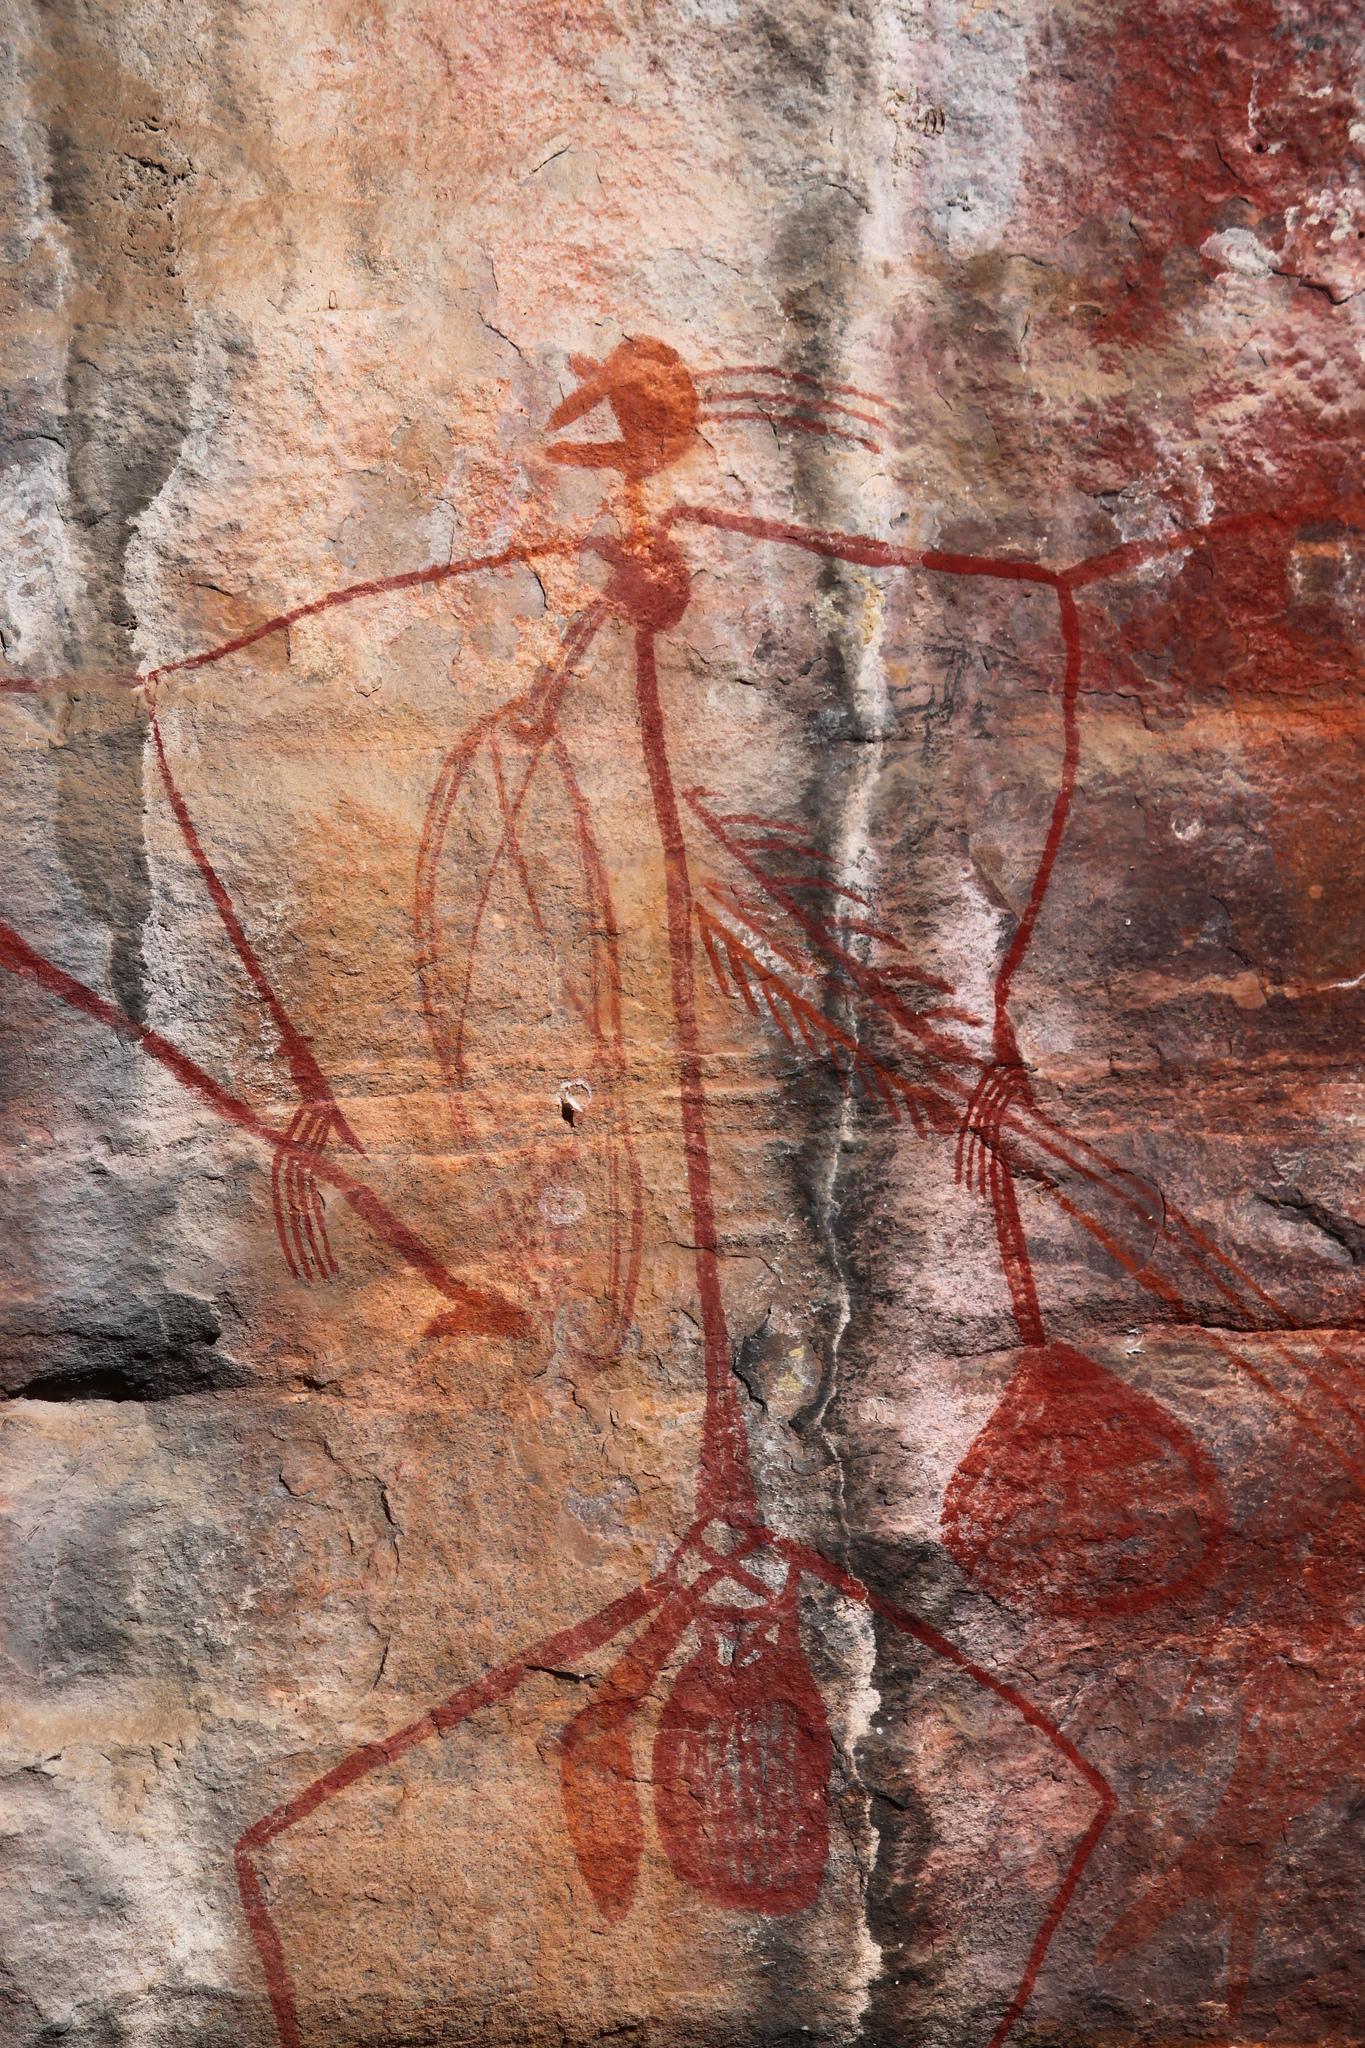 https://i1.wp.com/upload.wikimedia.org/wikipedia/commons/a/ae/Aboriginal_rock_art_-Ubirr_Art_Site%2C_Kakadu_National_Park%2C_Northern_Territory%2C_Australia-9June2012.jpg